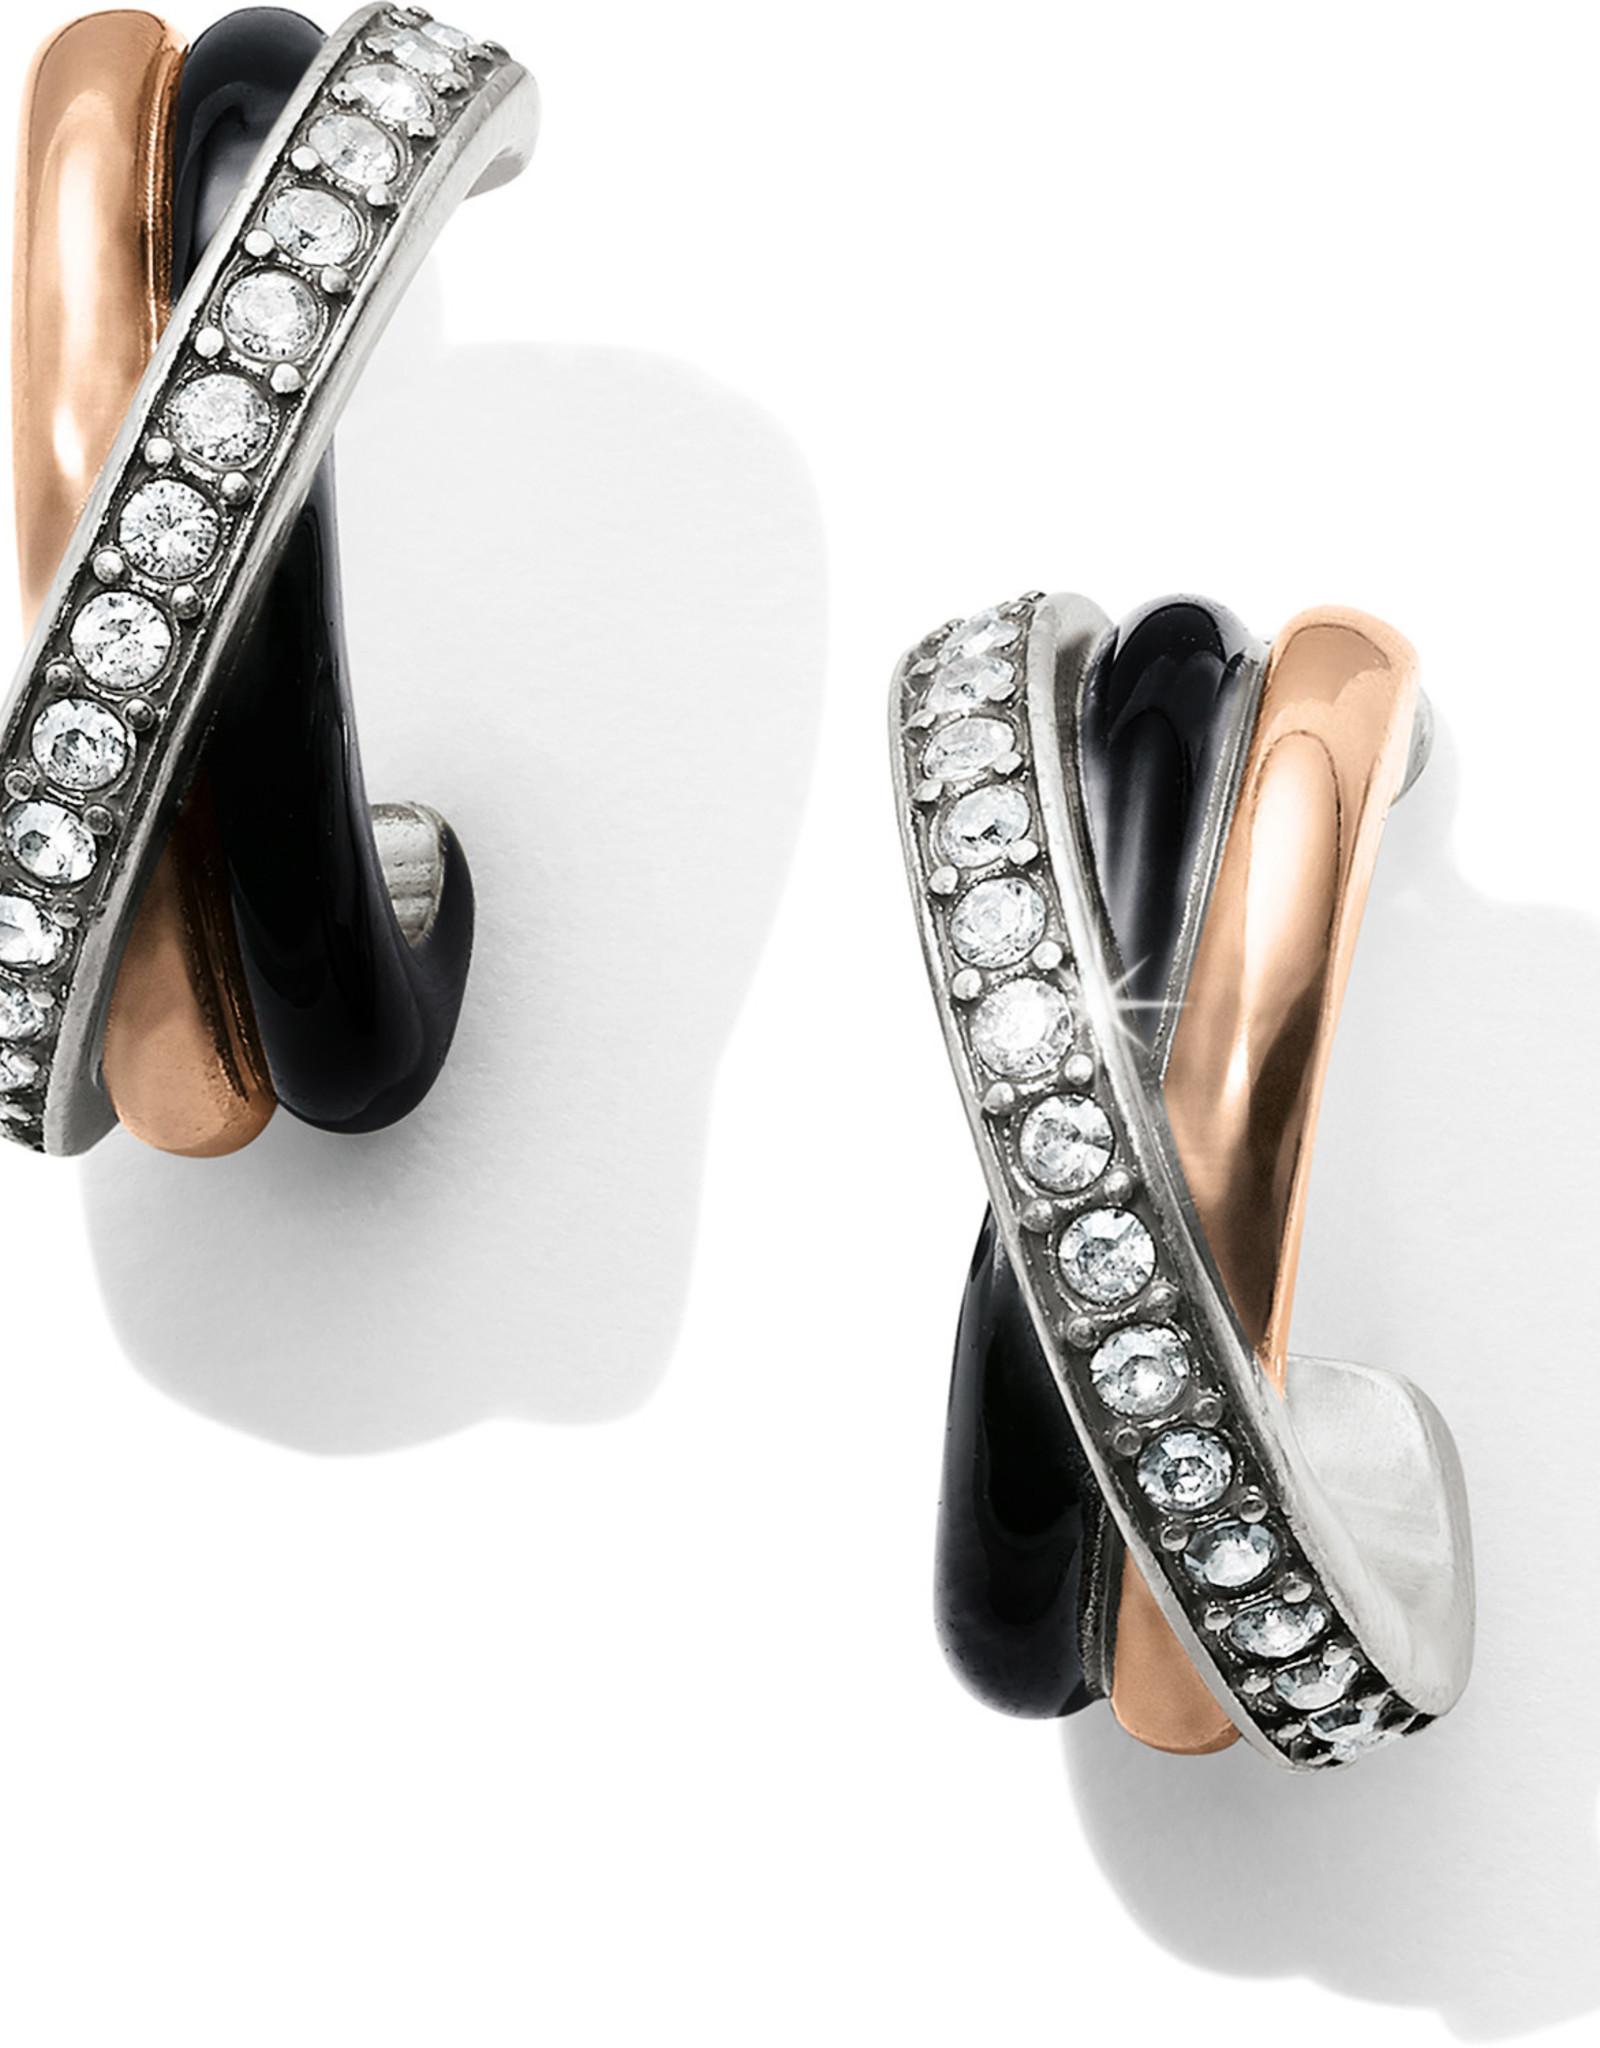 Brighton Brighton Earrings Neptune's Ring Post Clip- Black/Silver/Gold